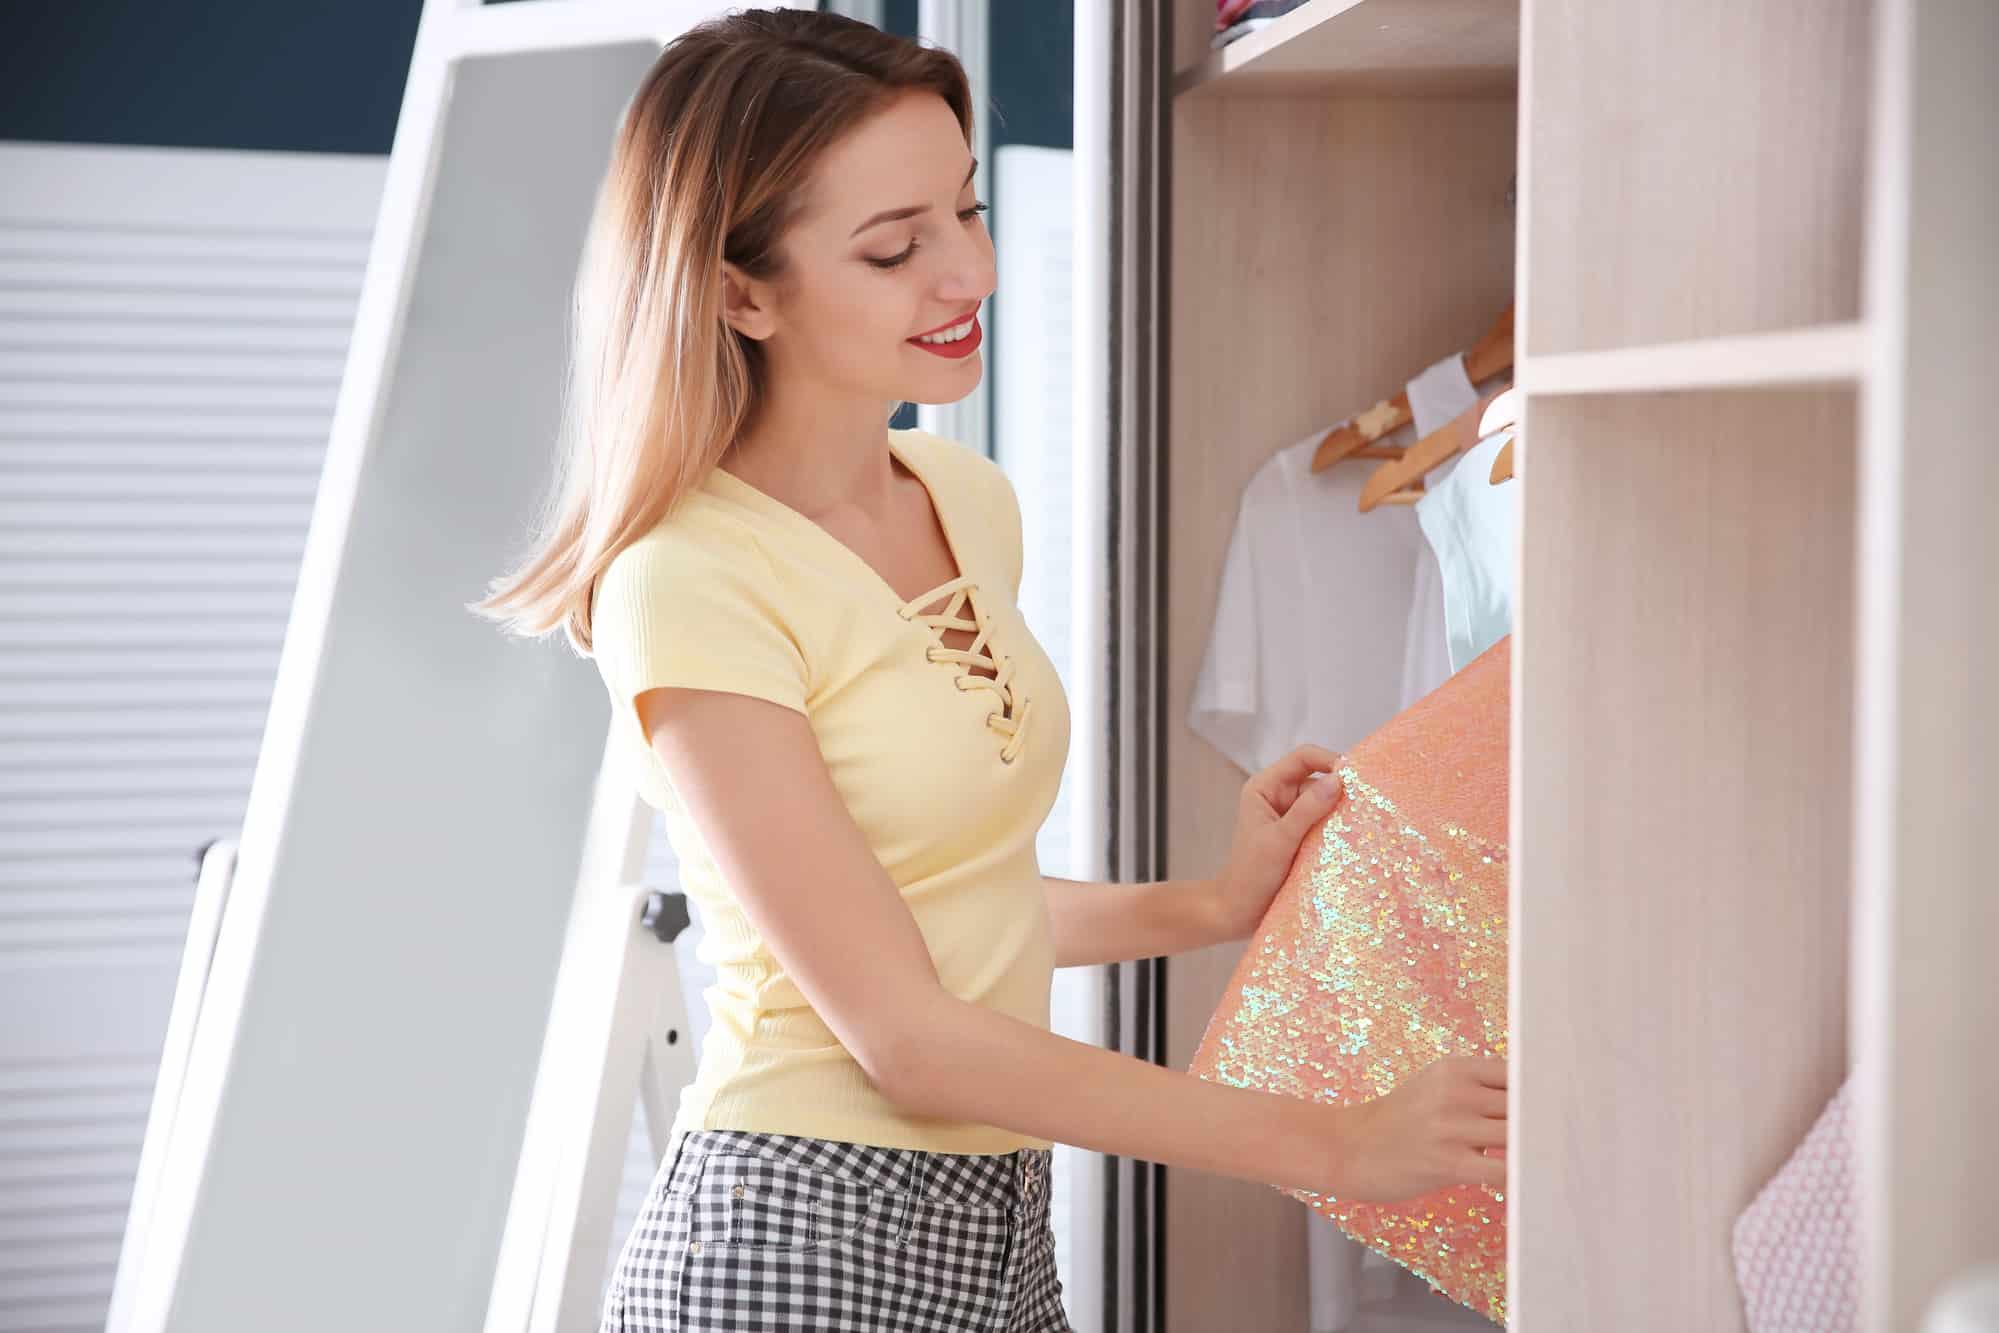 Adding Closet Lights To Brighten Your Day